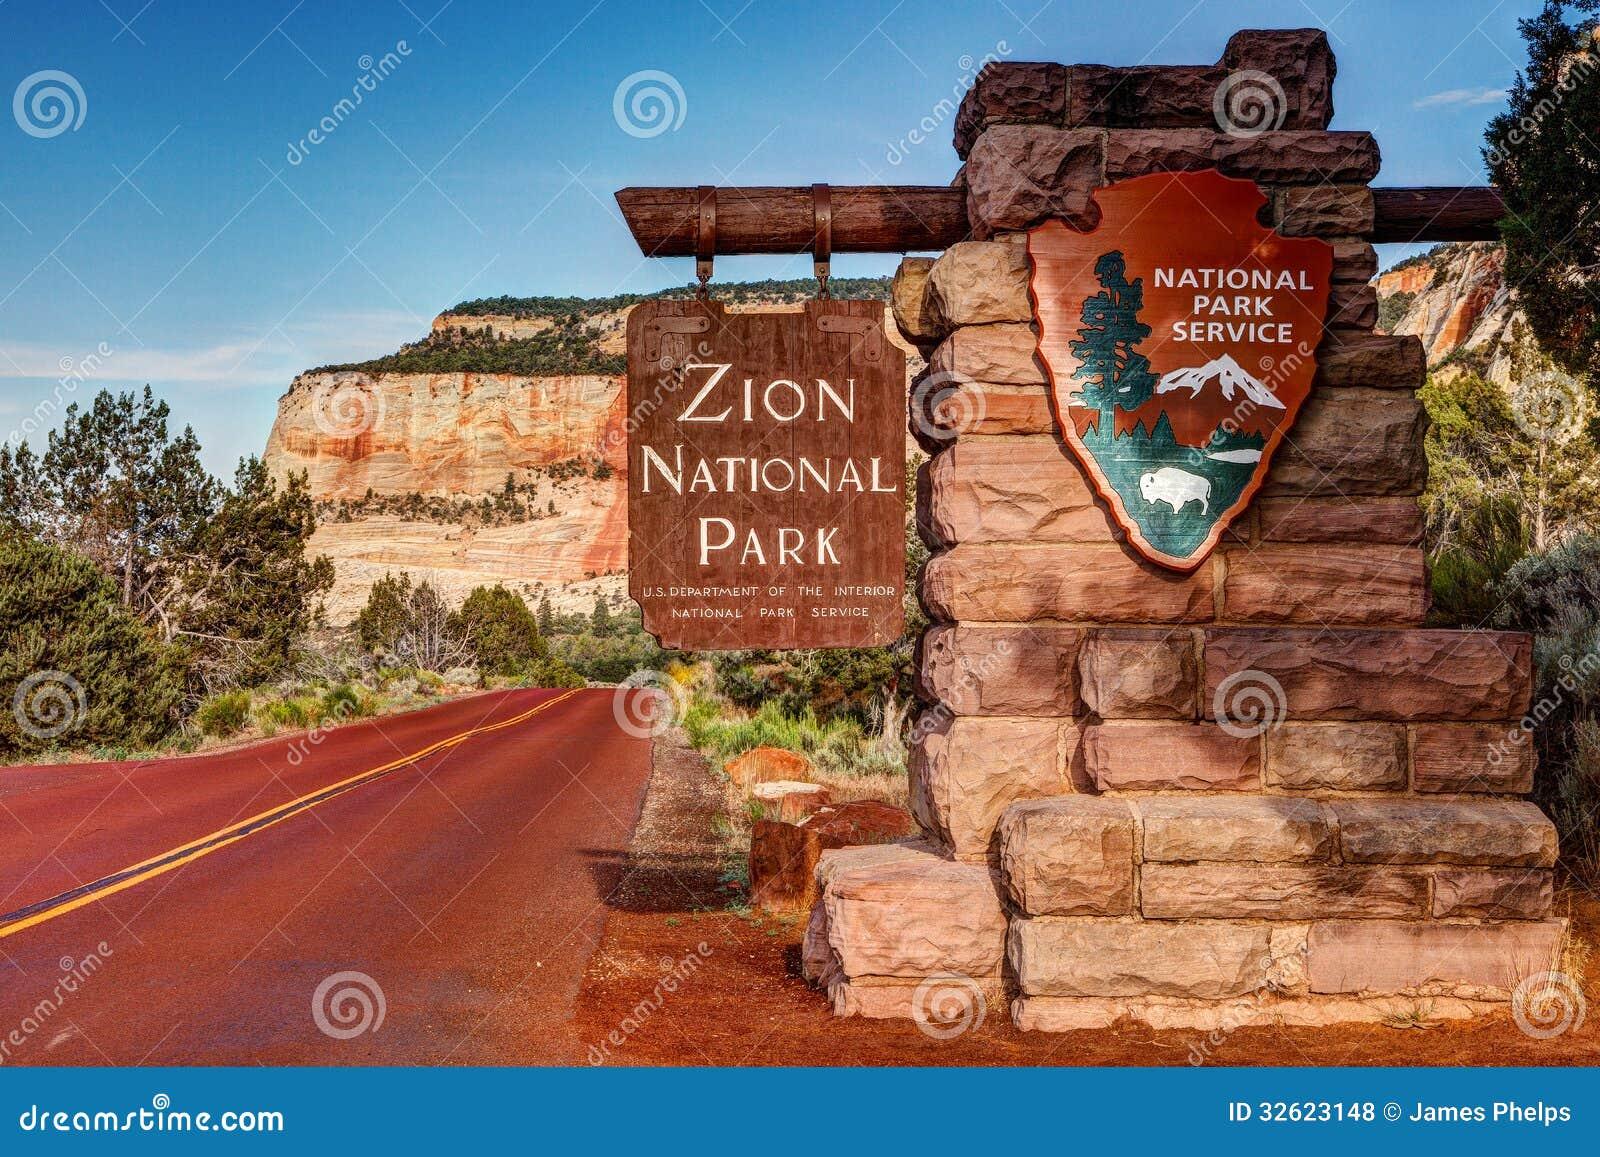 Знак национального парка Сиона